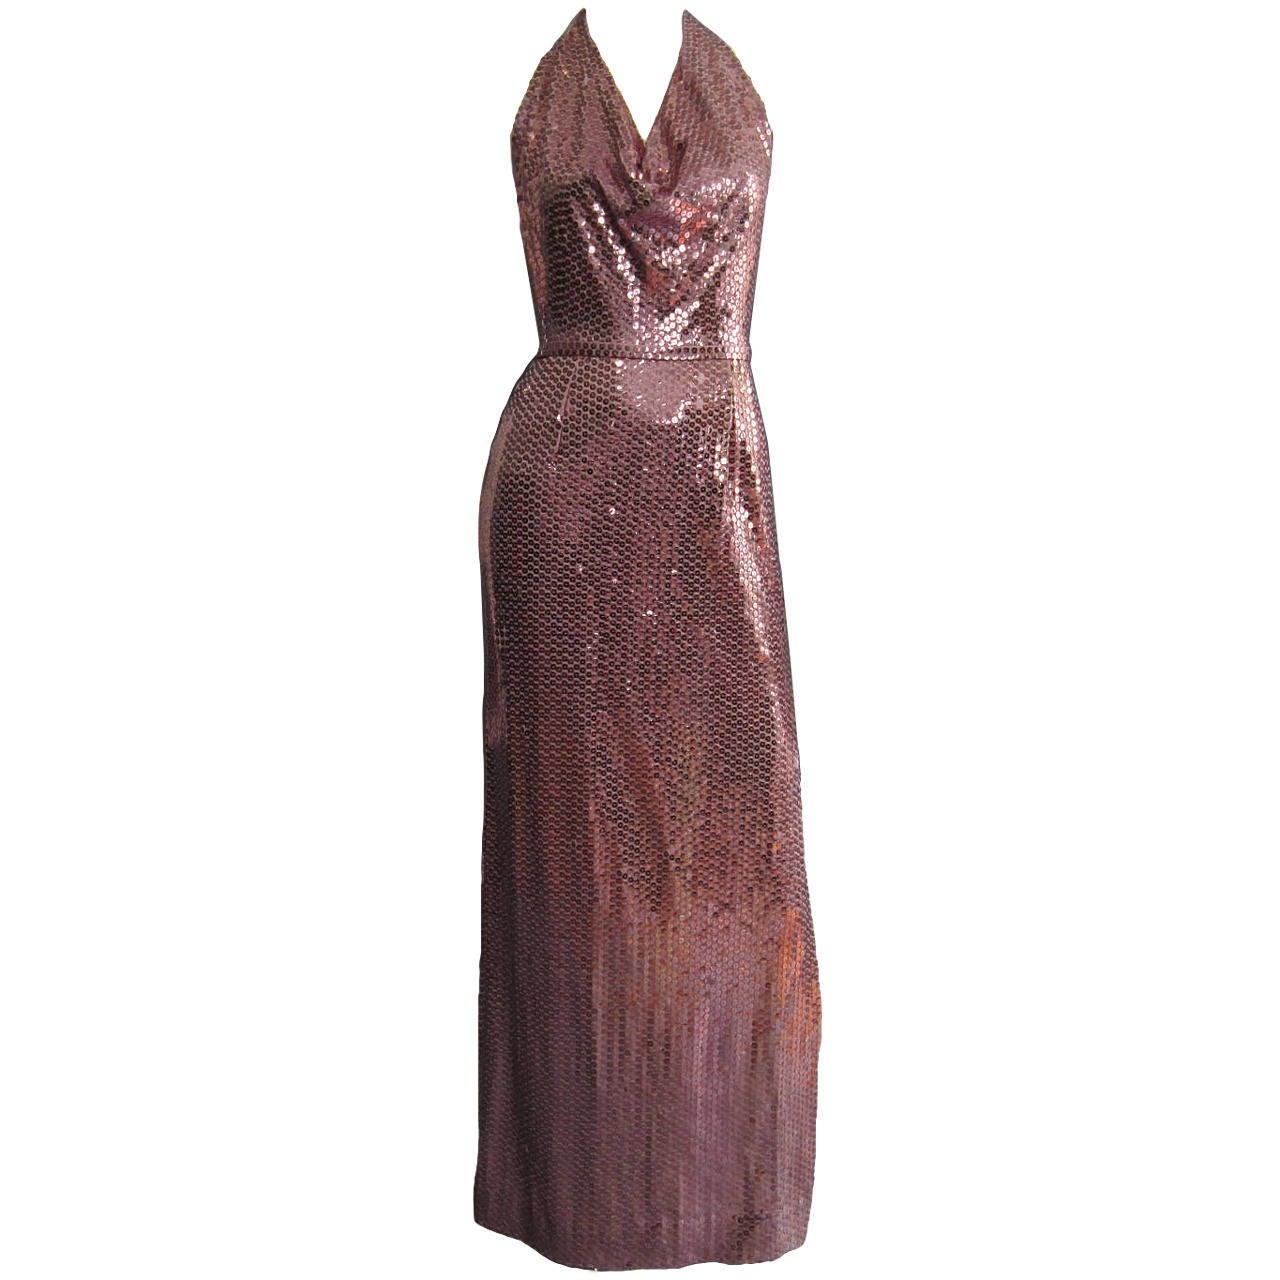 LILLIE RUBIN Pink Sequin Disco Halter Gown at 1stdibs